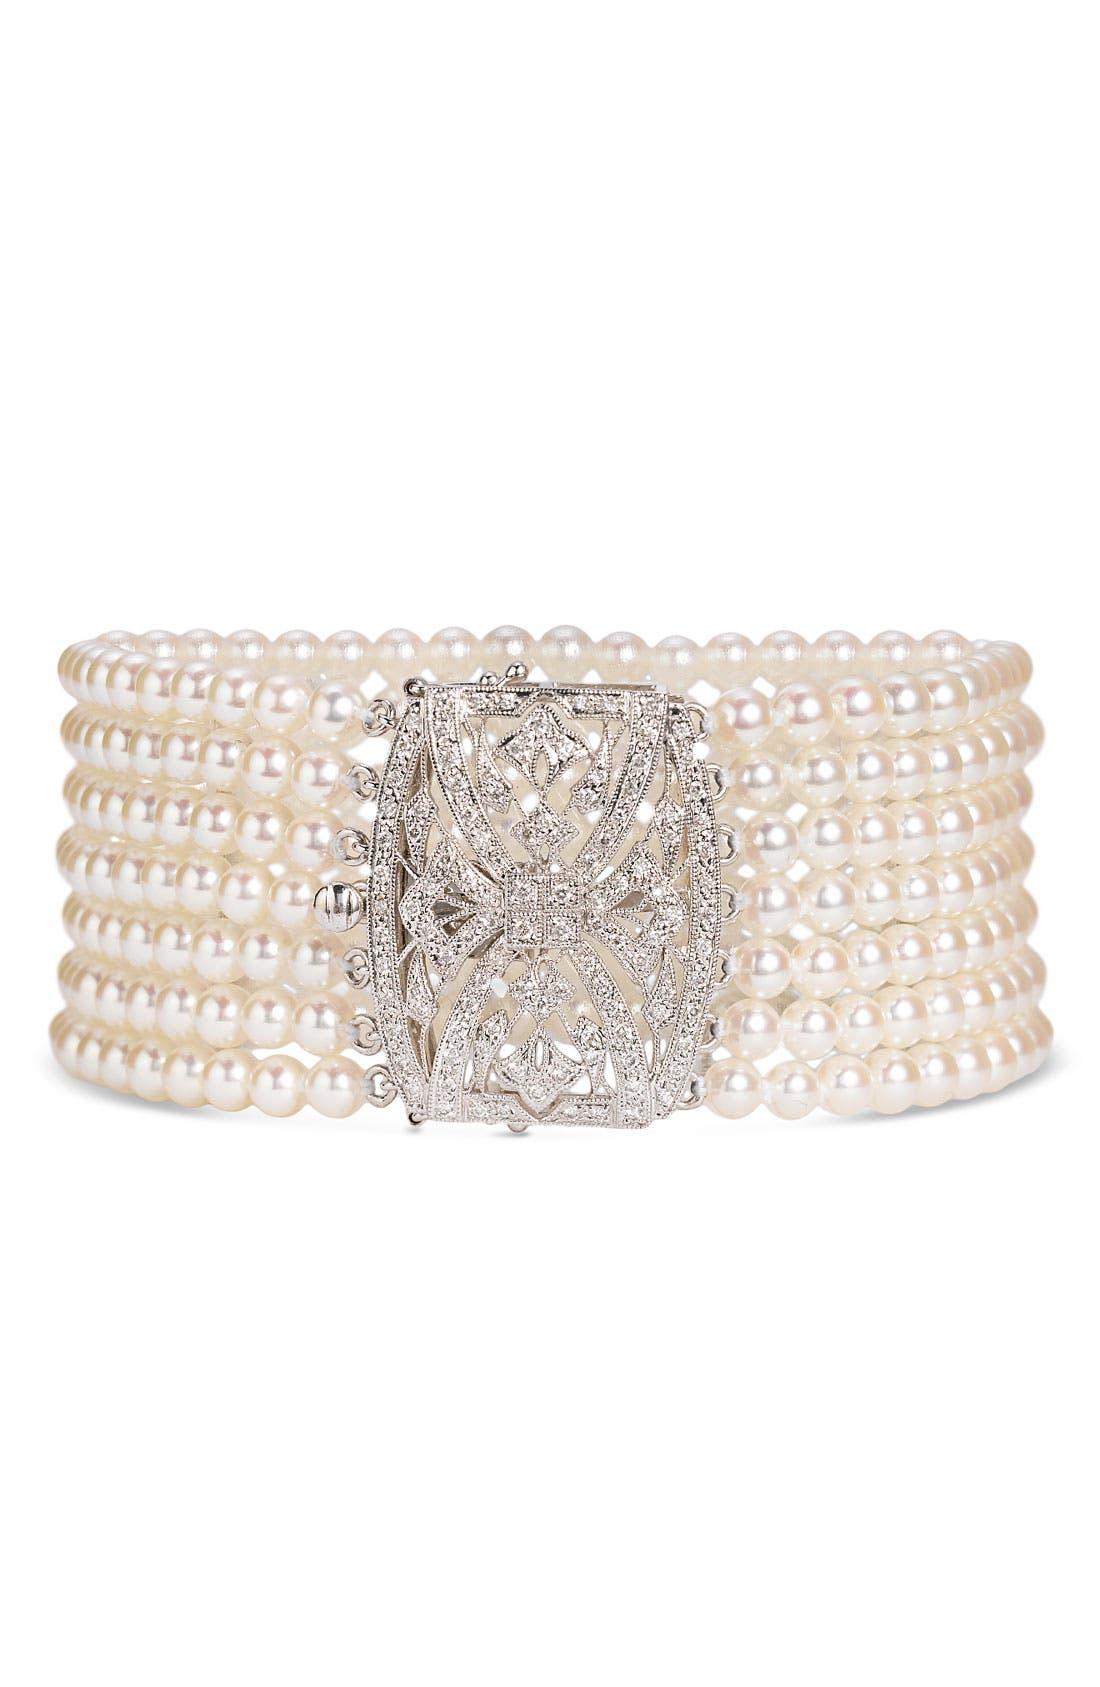 Alternate Image 1 Selected - Mastoloni 7-Strand Pearl & Diamond Clasp Bracelet